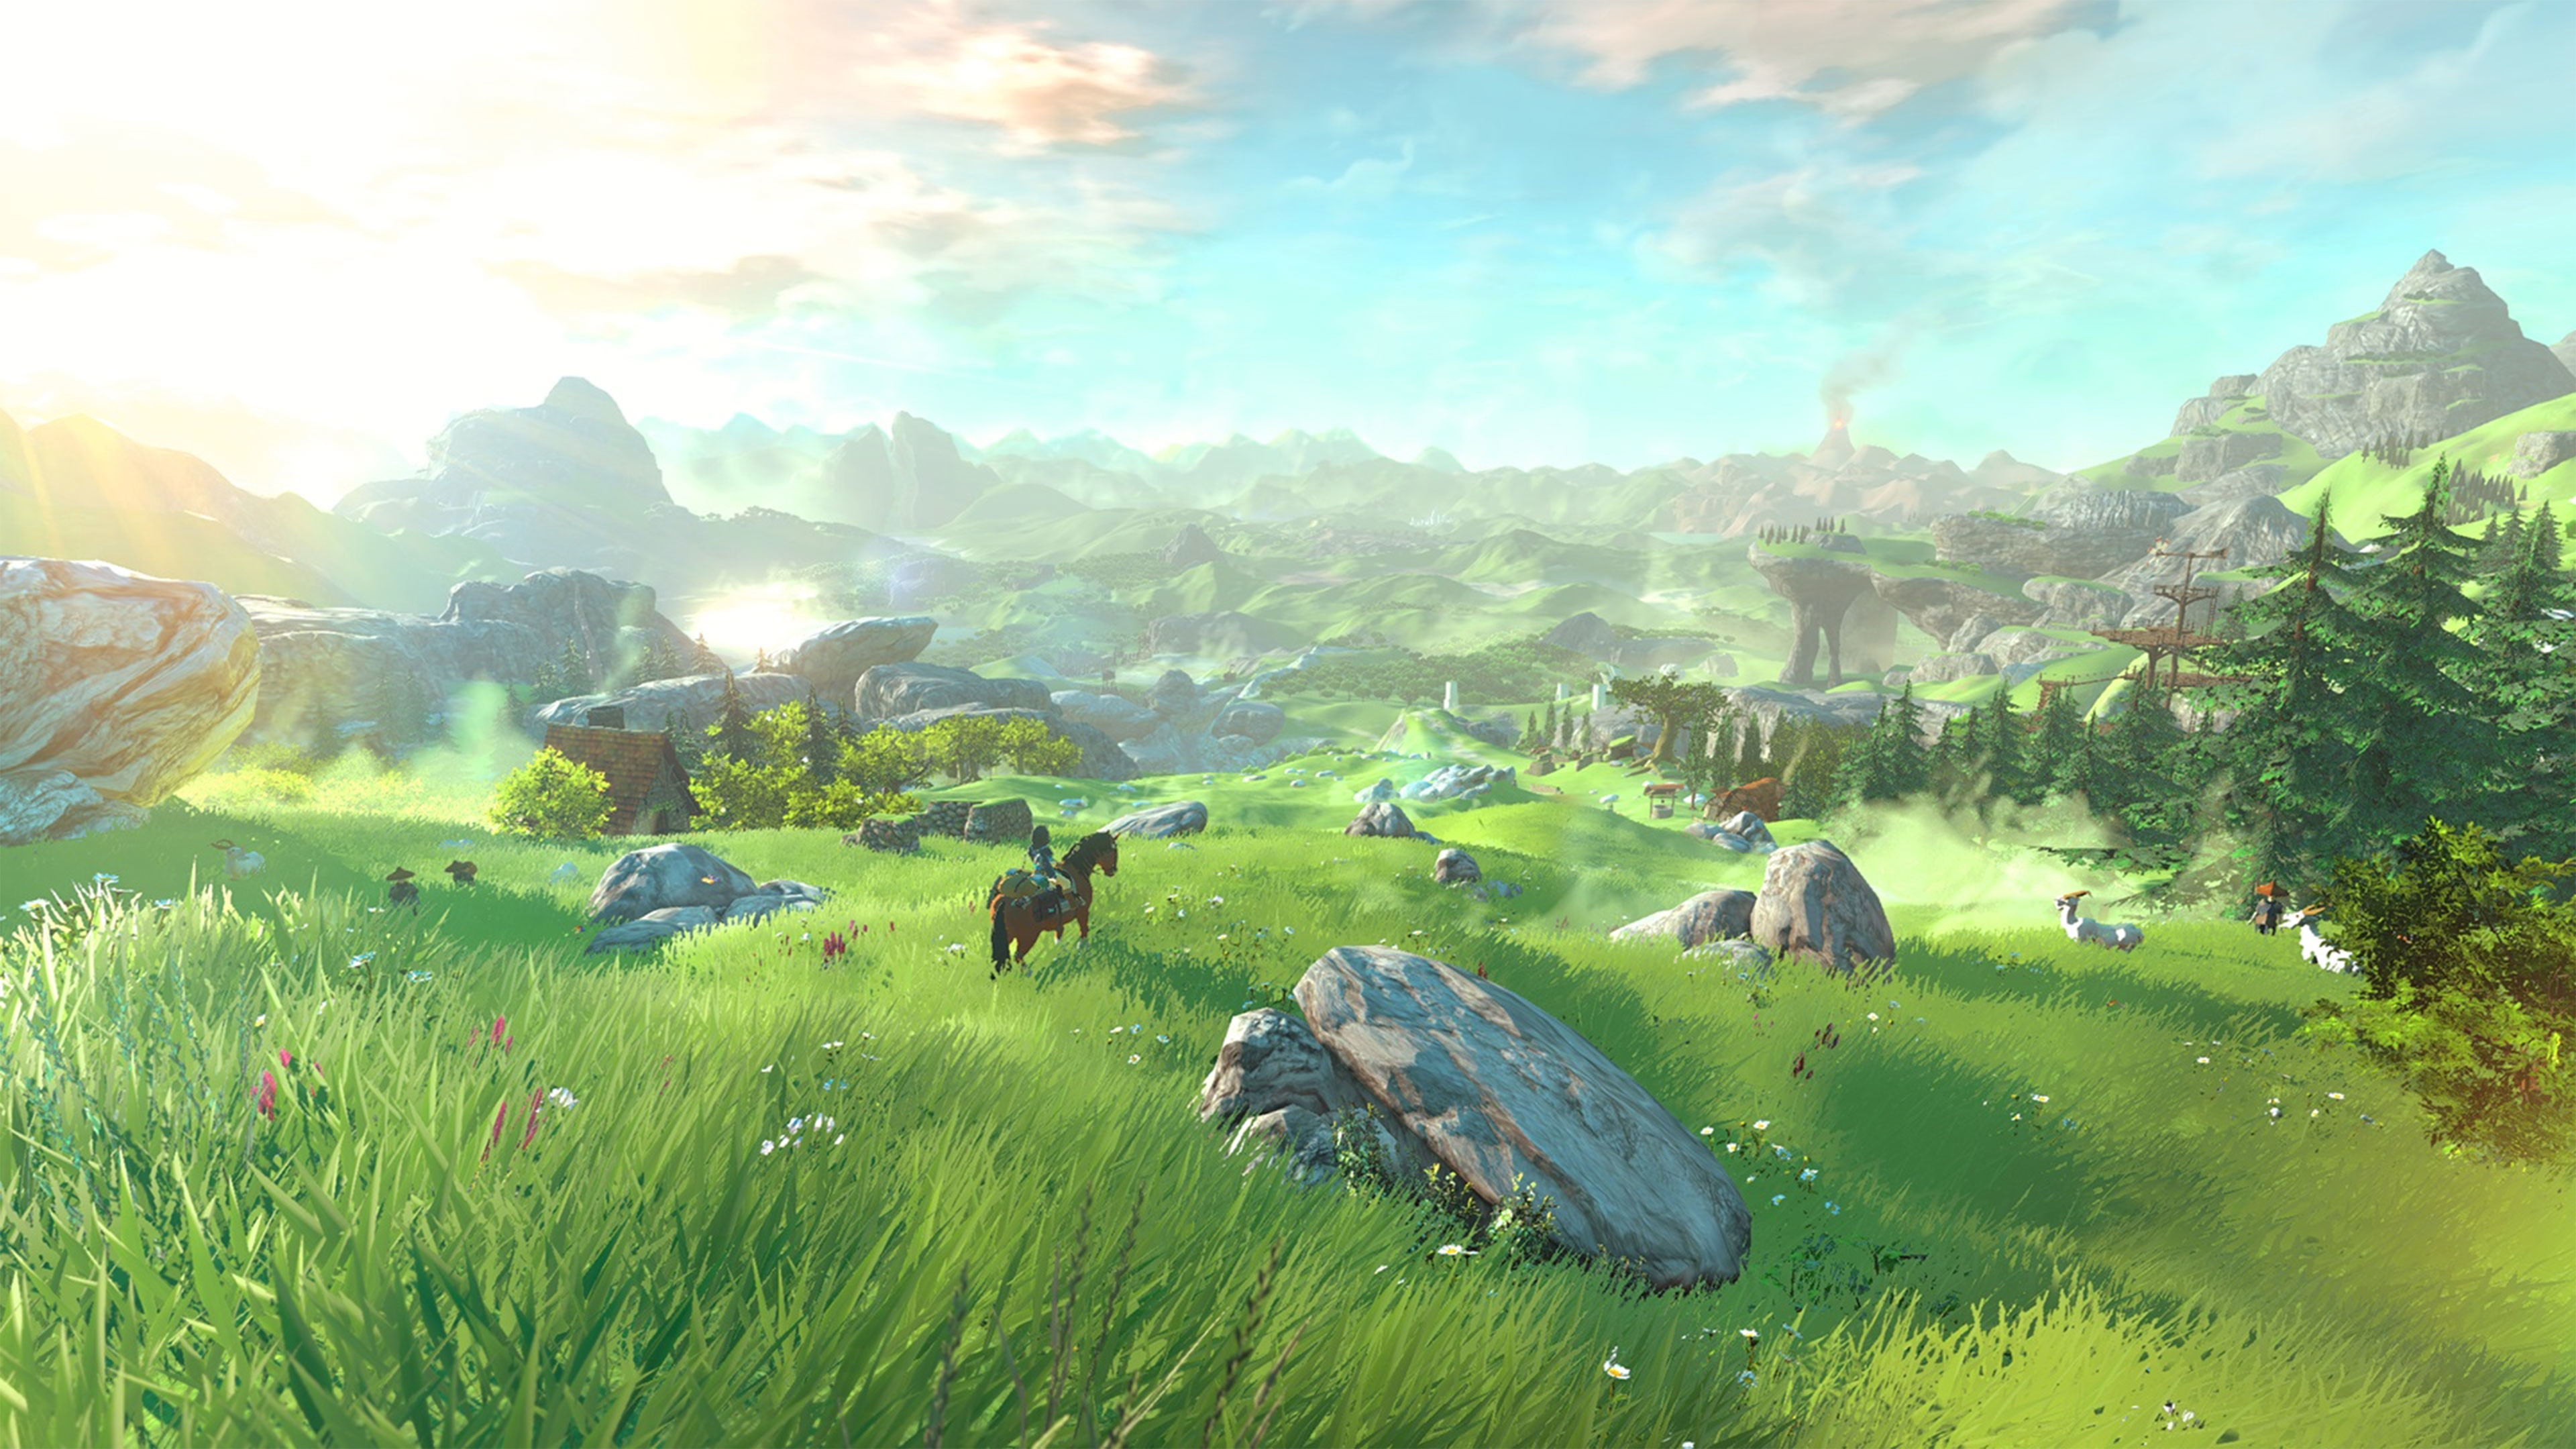 Res: 3840x2160, The Legend of Zelda Twilight Princess HD 4K Wallpaper ...